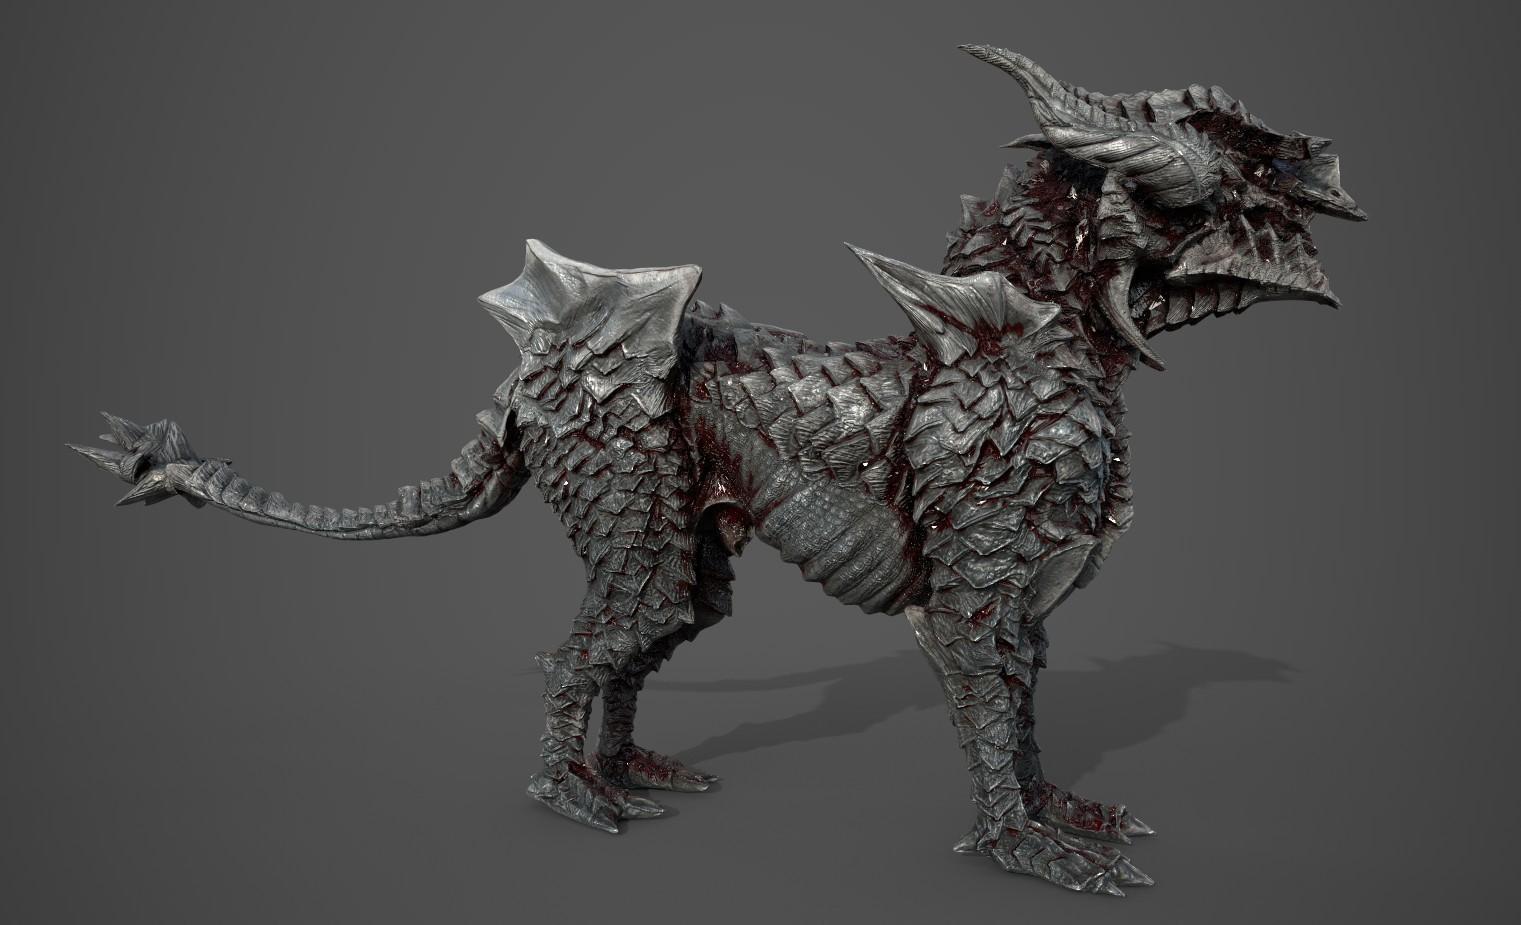 david-lesperance-hellhound.jpg